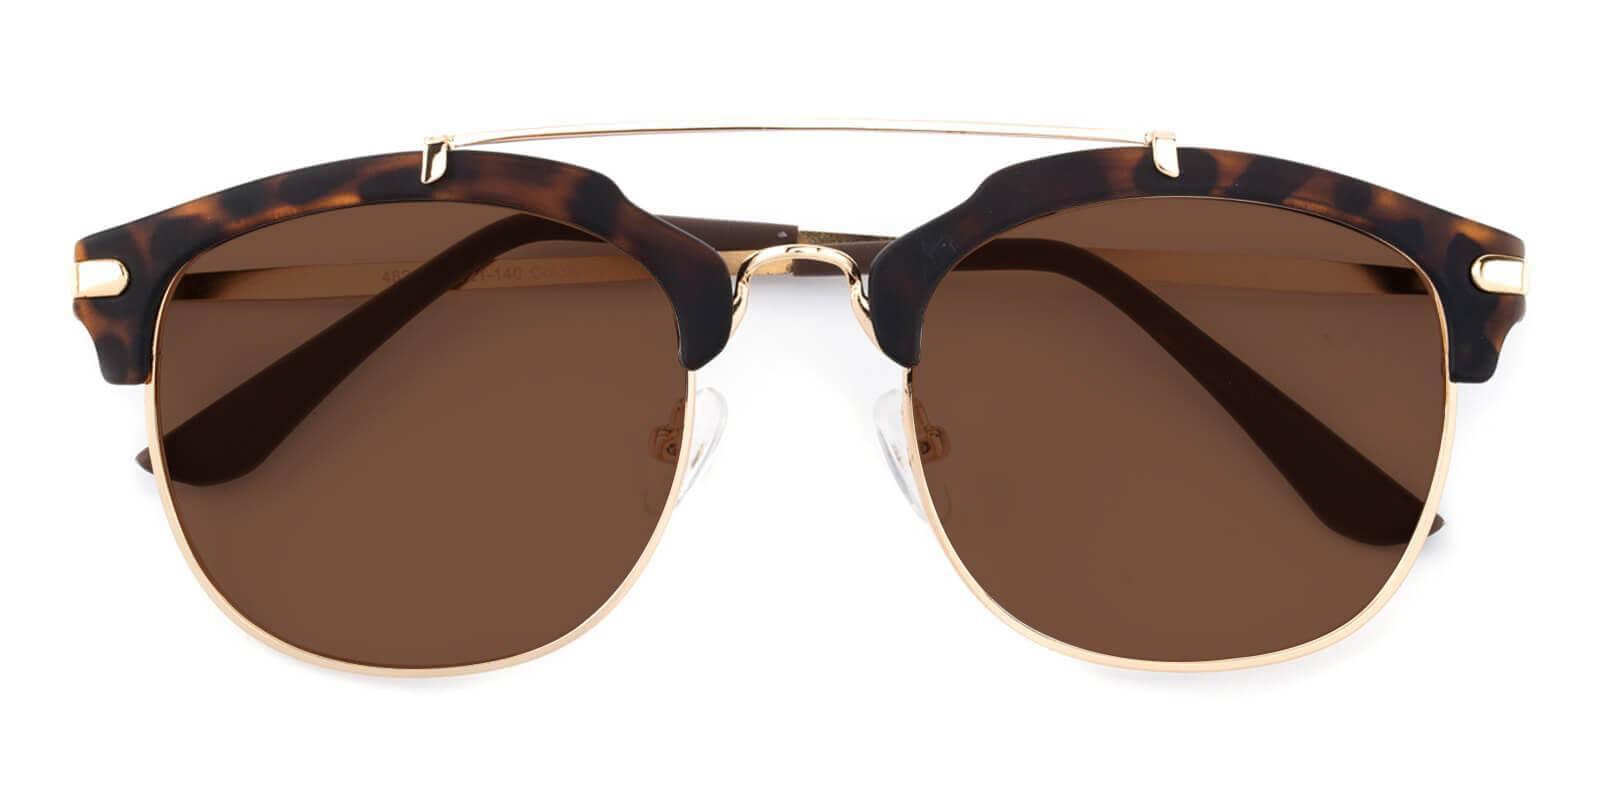 Icychem-Tortoise-Browline-Acetate-Sunglasses-detail